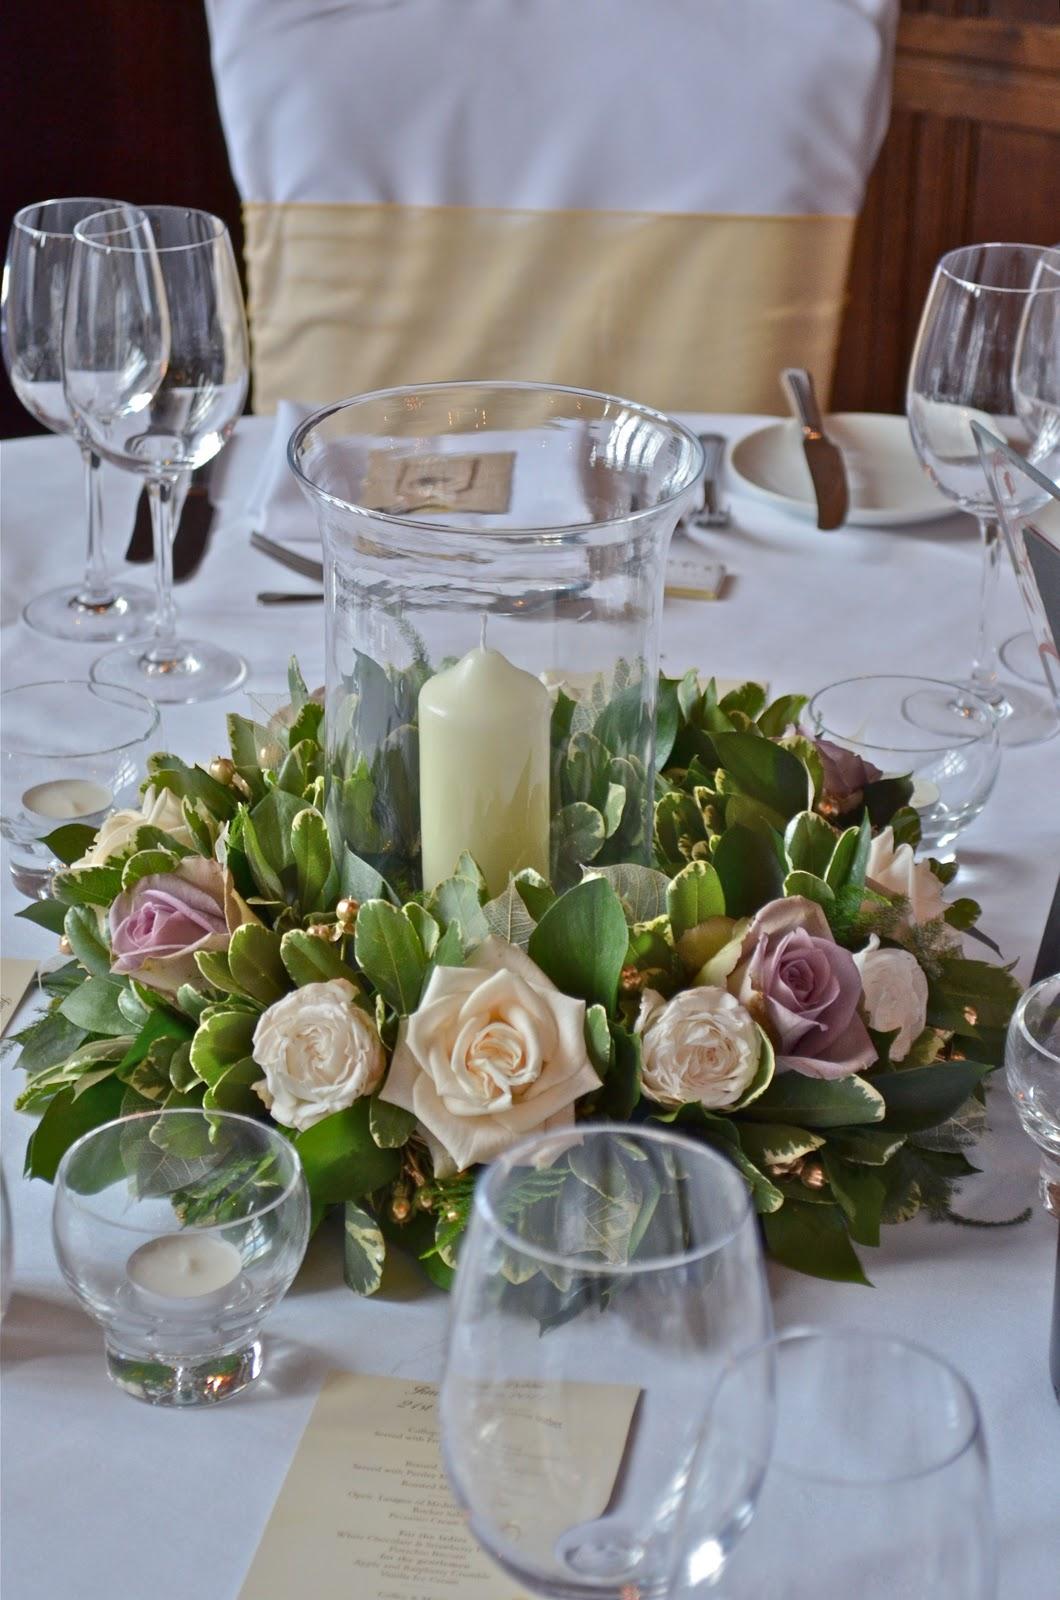 Wedding Flowers Blog: Debbie's Vintage Autumn Wedding